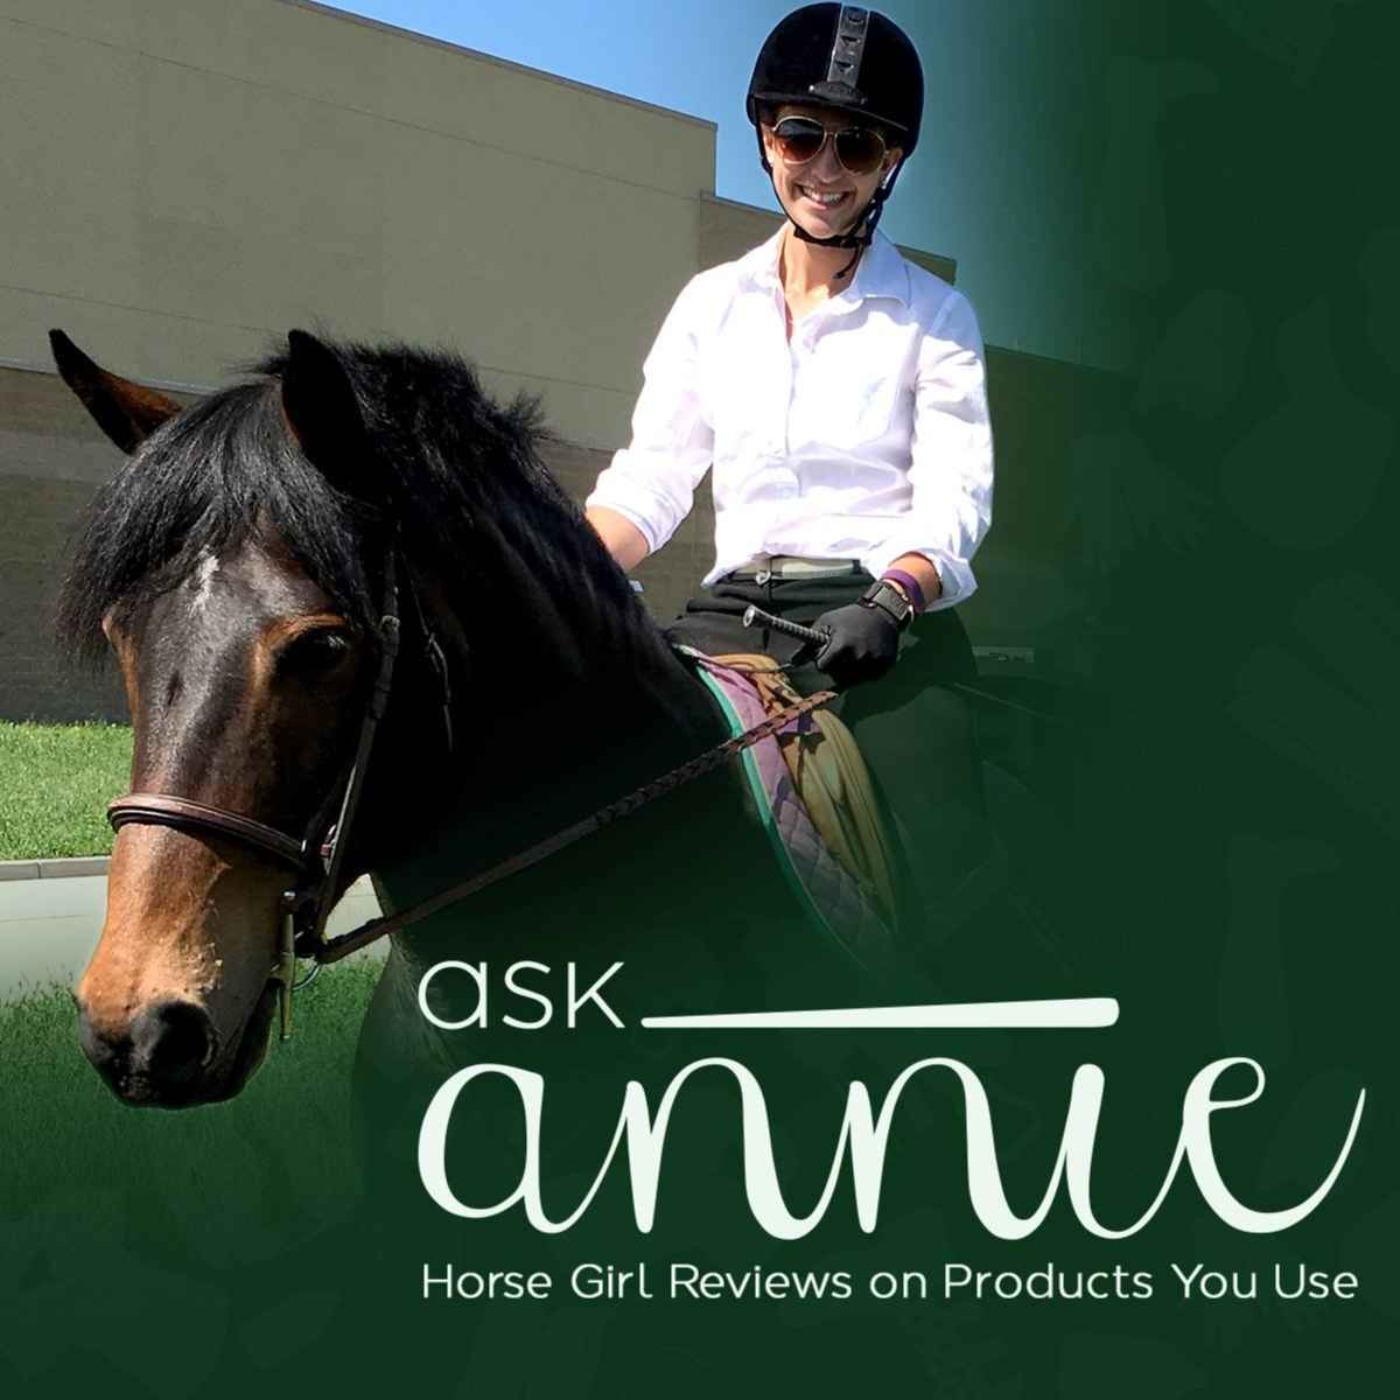 #AskAnnie - Episode 56: Sam Sofer, PhD, PE, President & Chief Scientist Air & Water Solutions, BioOx